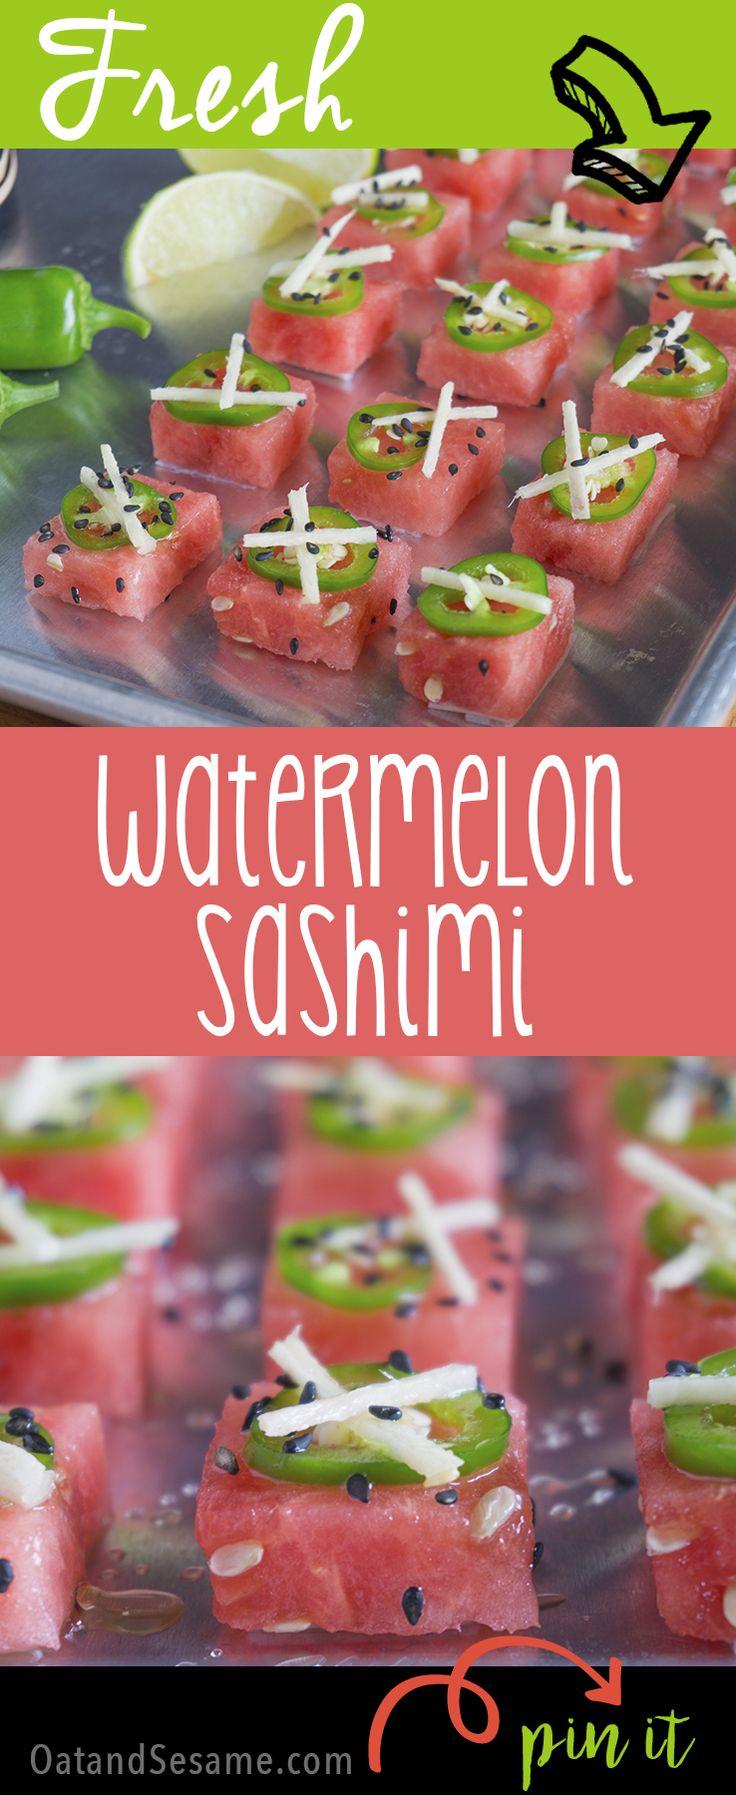 Fresh watermelon sashimi! A beautiful party appetizer or fun snack! | recipe at OatandSesame.com